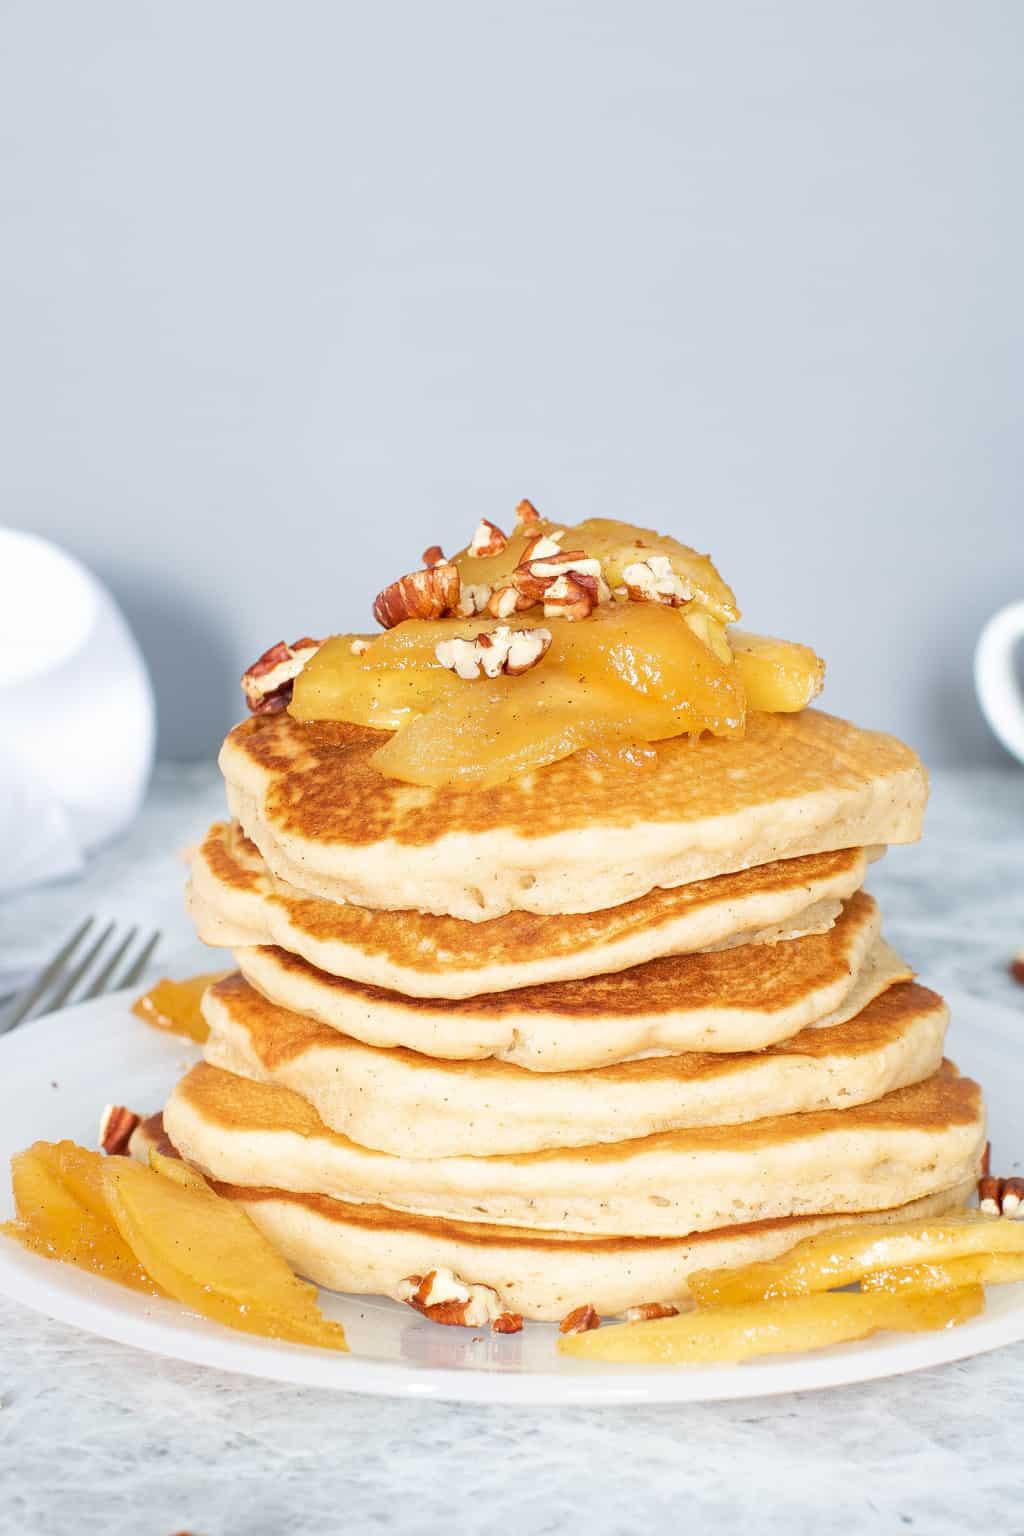 Warm Vegan Apple Cinnamon Pancakes